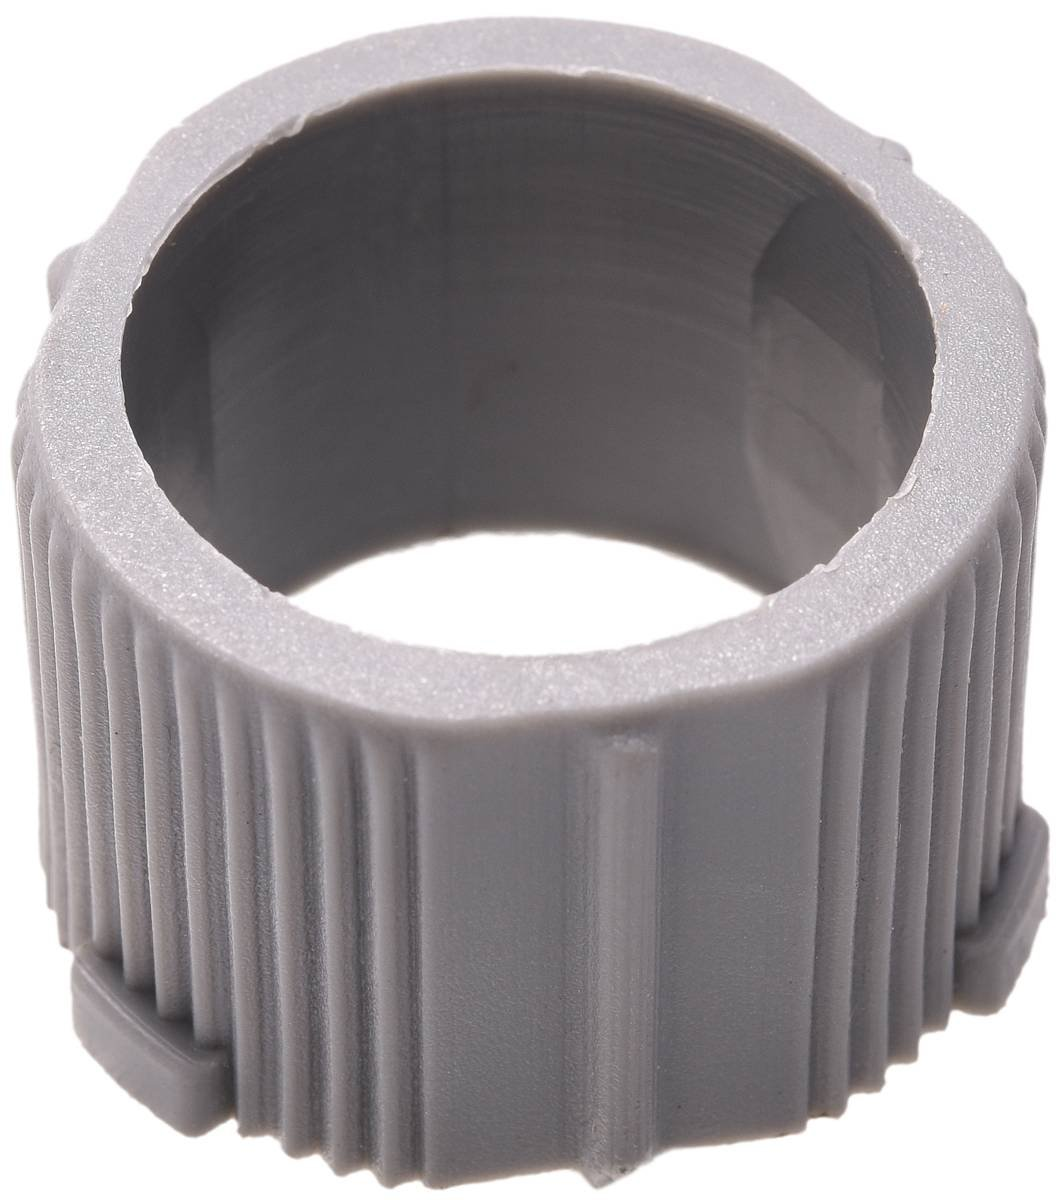 45522-10080 / 4552210080 - Bushing For Steering Gear For Toyota Febest